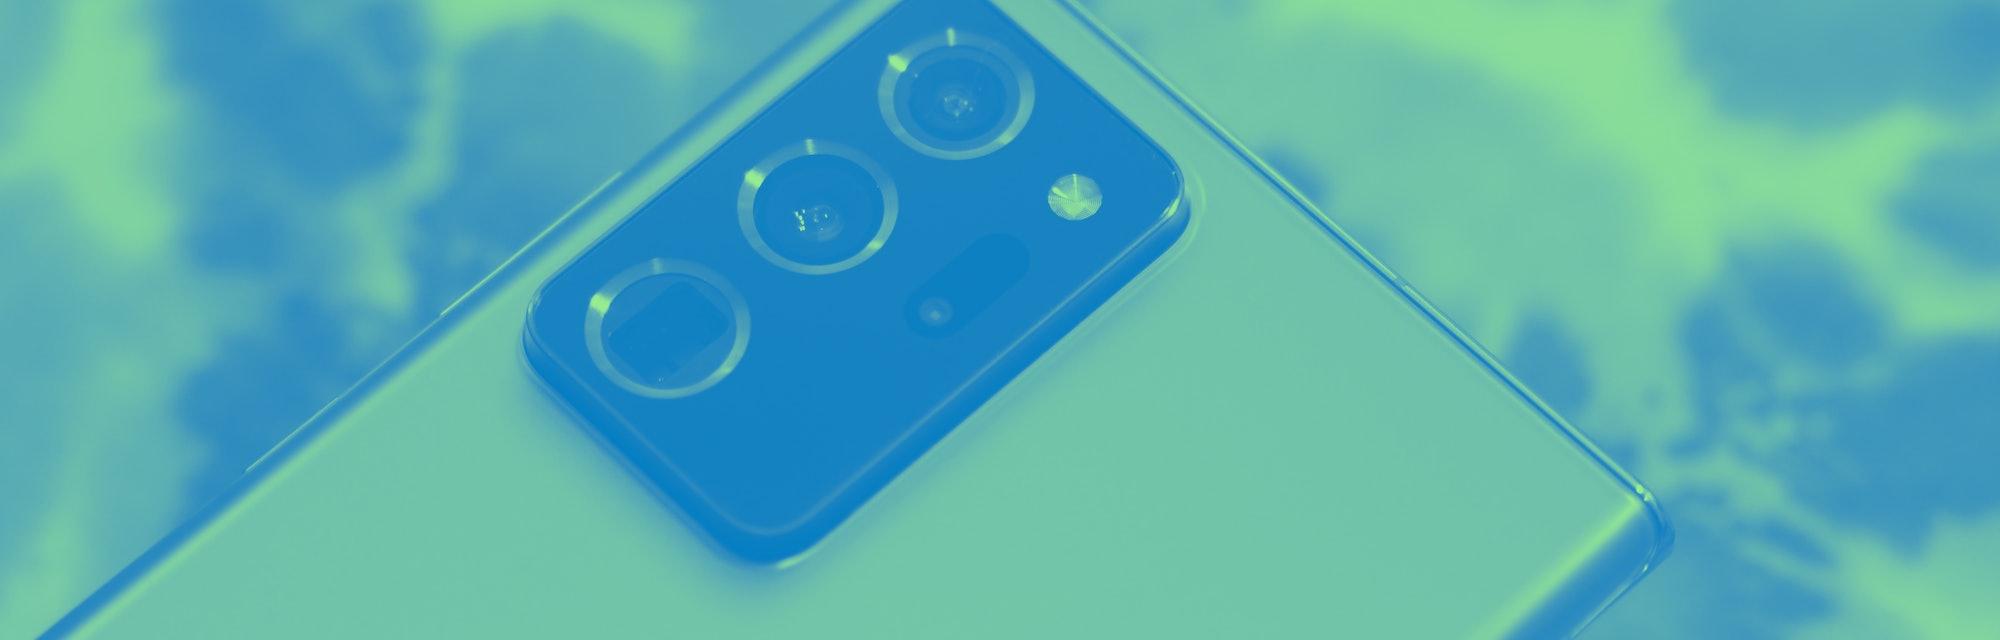 Samsung Galaxy Note 20 Ultra review: camera